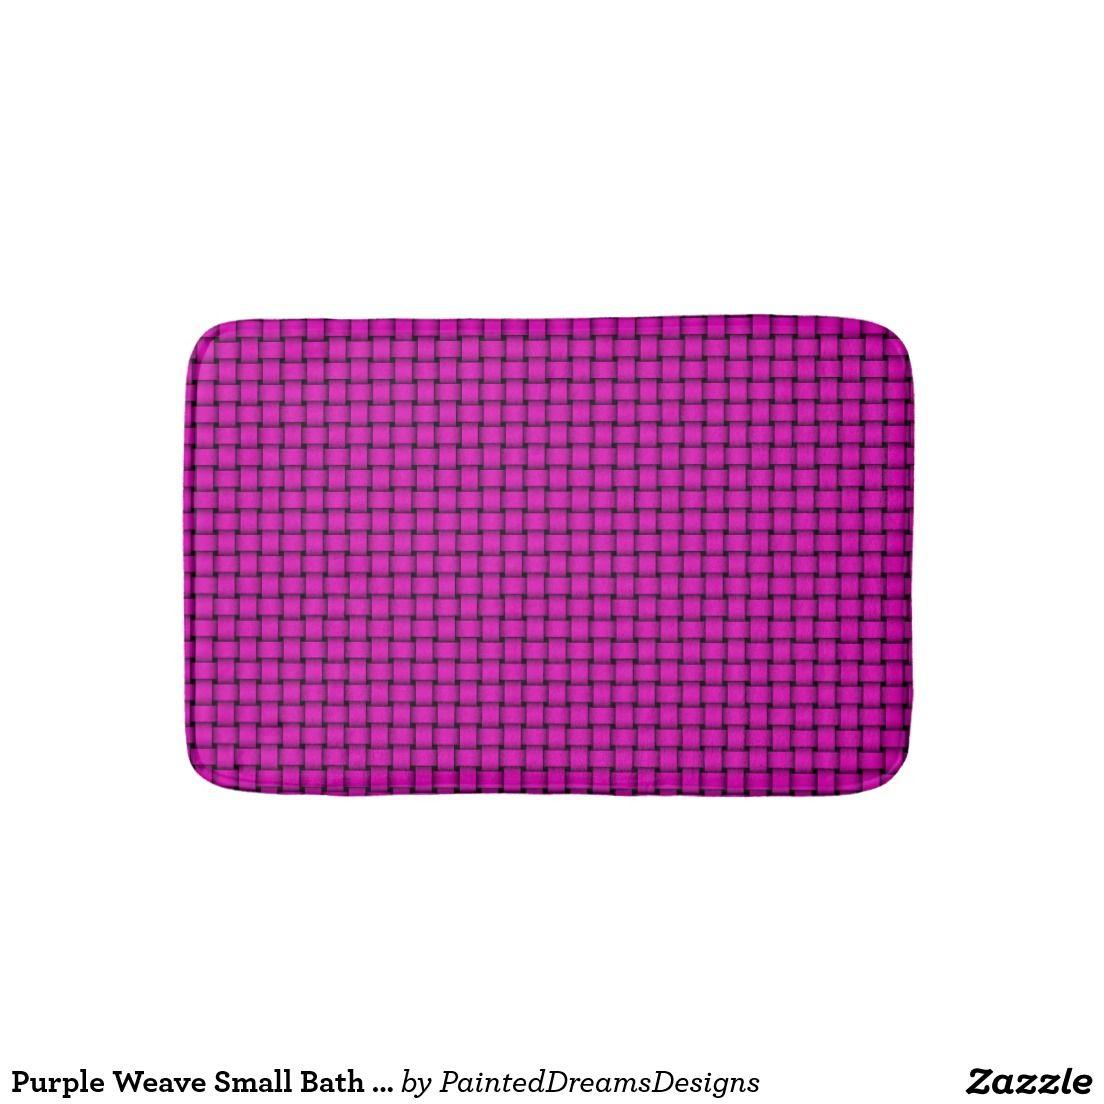 Purple weave small bath mat bath mats bathroom decor pinterest